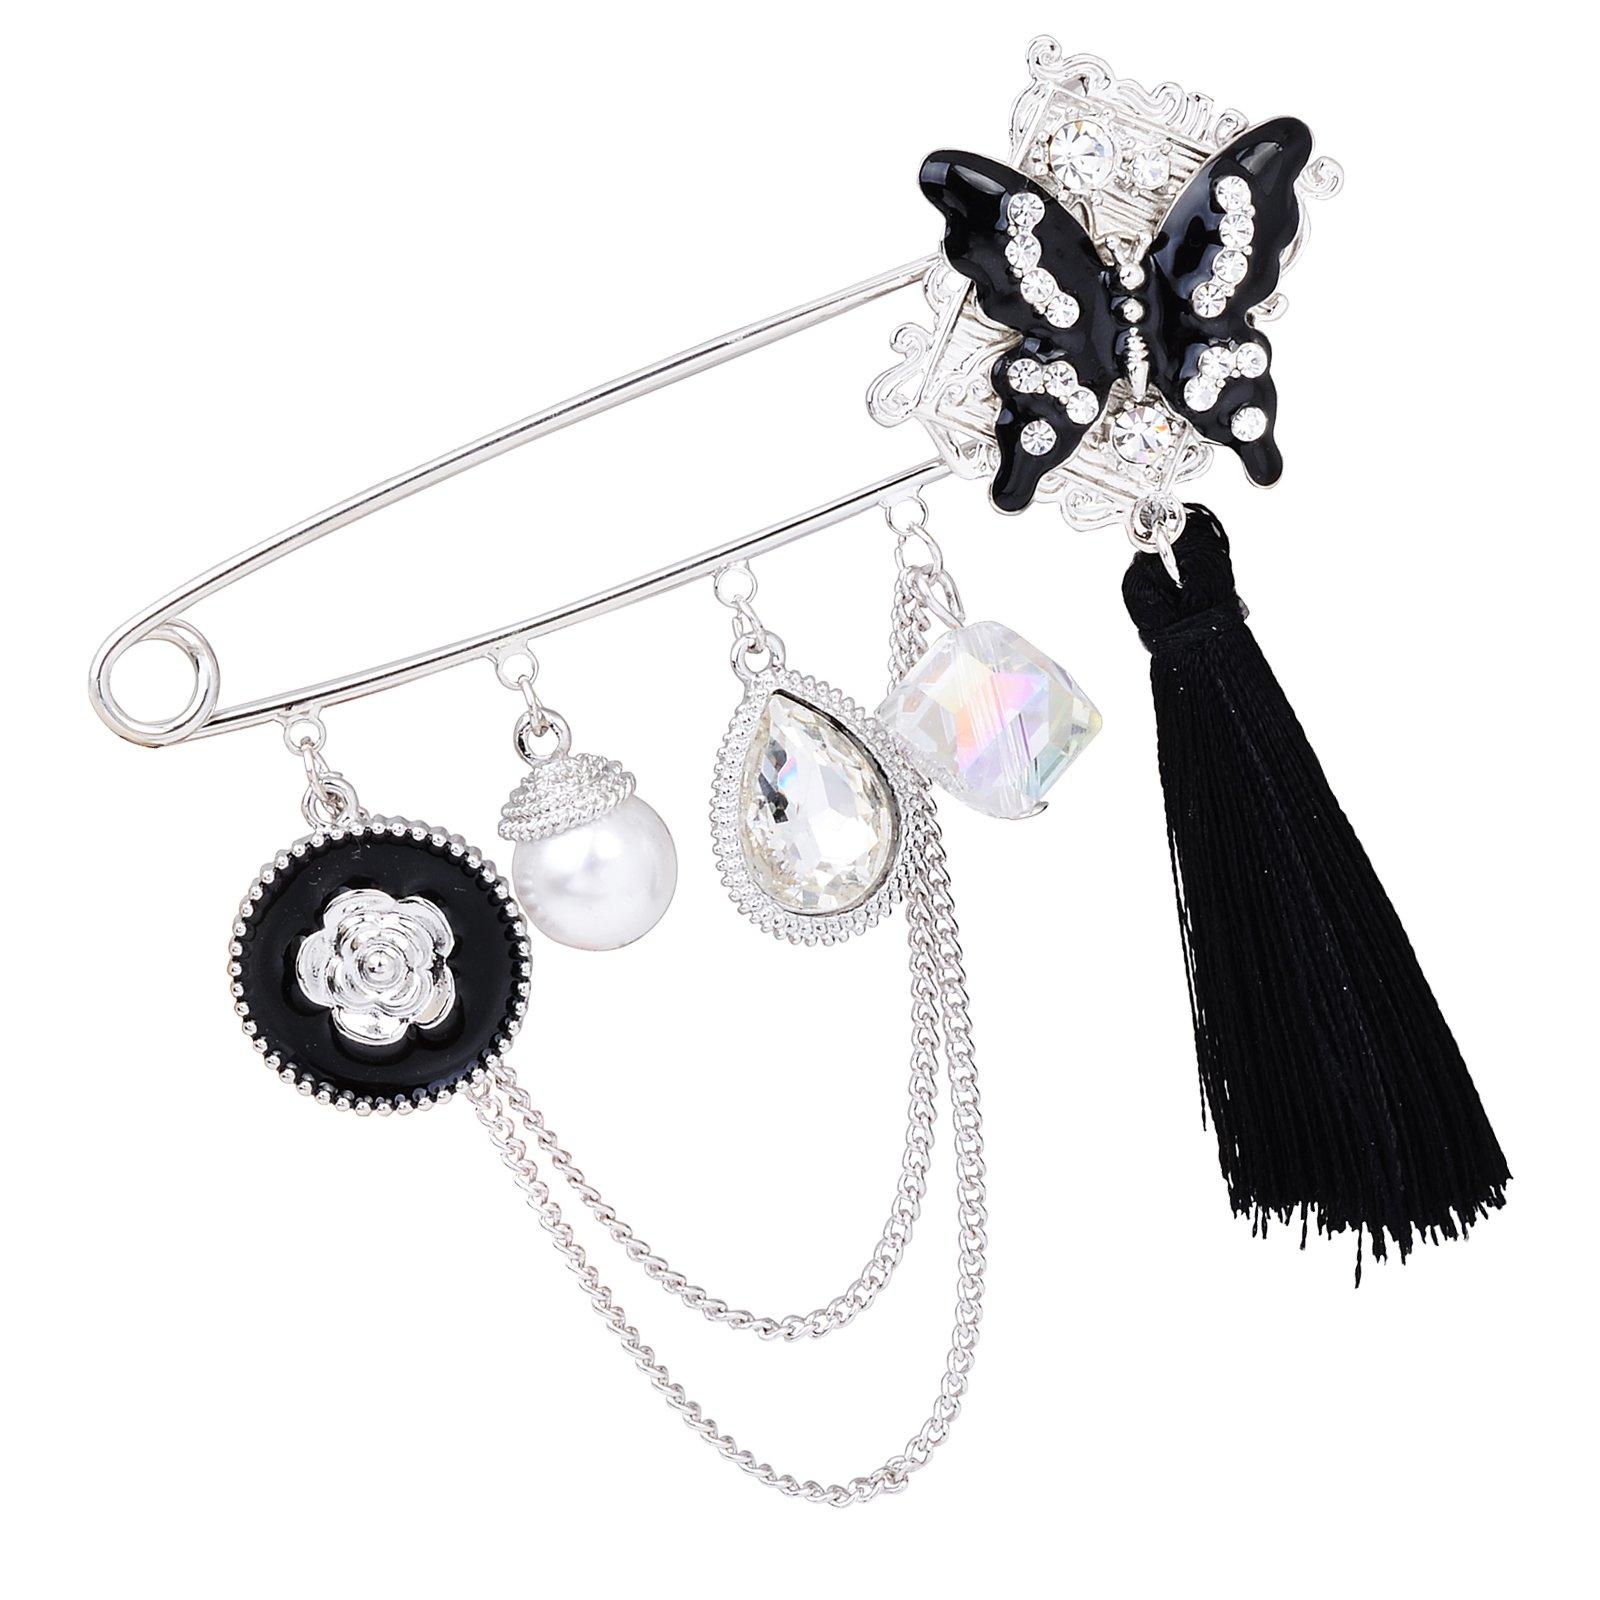 Fenni Black Enamel Crystal Butterfly Large Safety Pins Brooch with Tassel Camellia Pearl Charm 3.2'' L